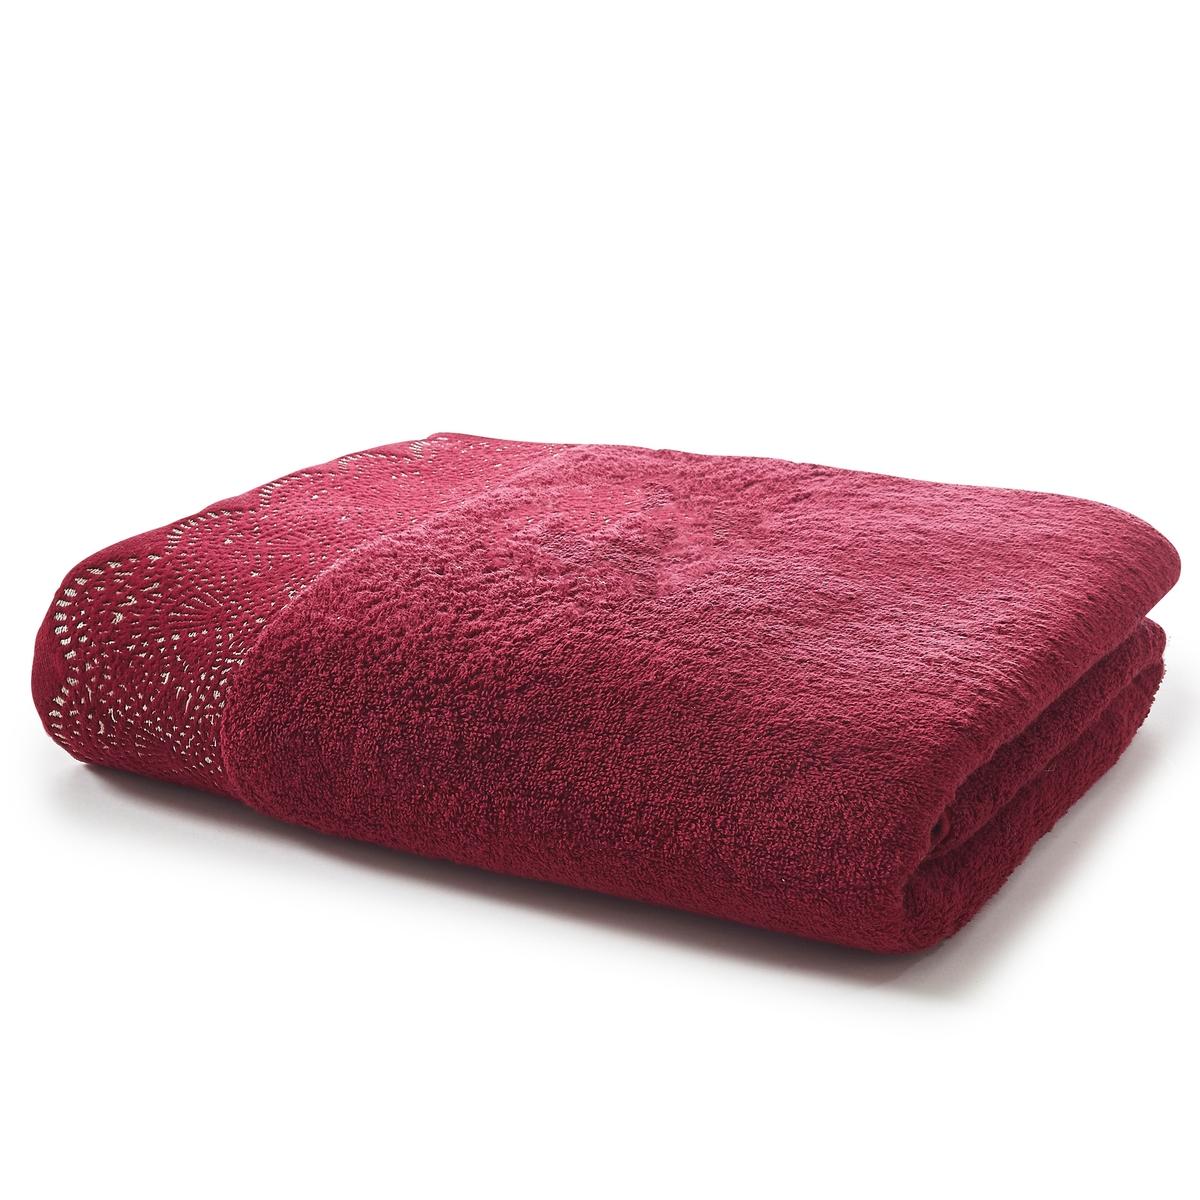 Полотенце из махровой ткани 500 г/м² DENTELLE